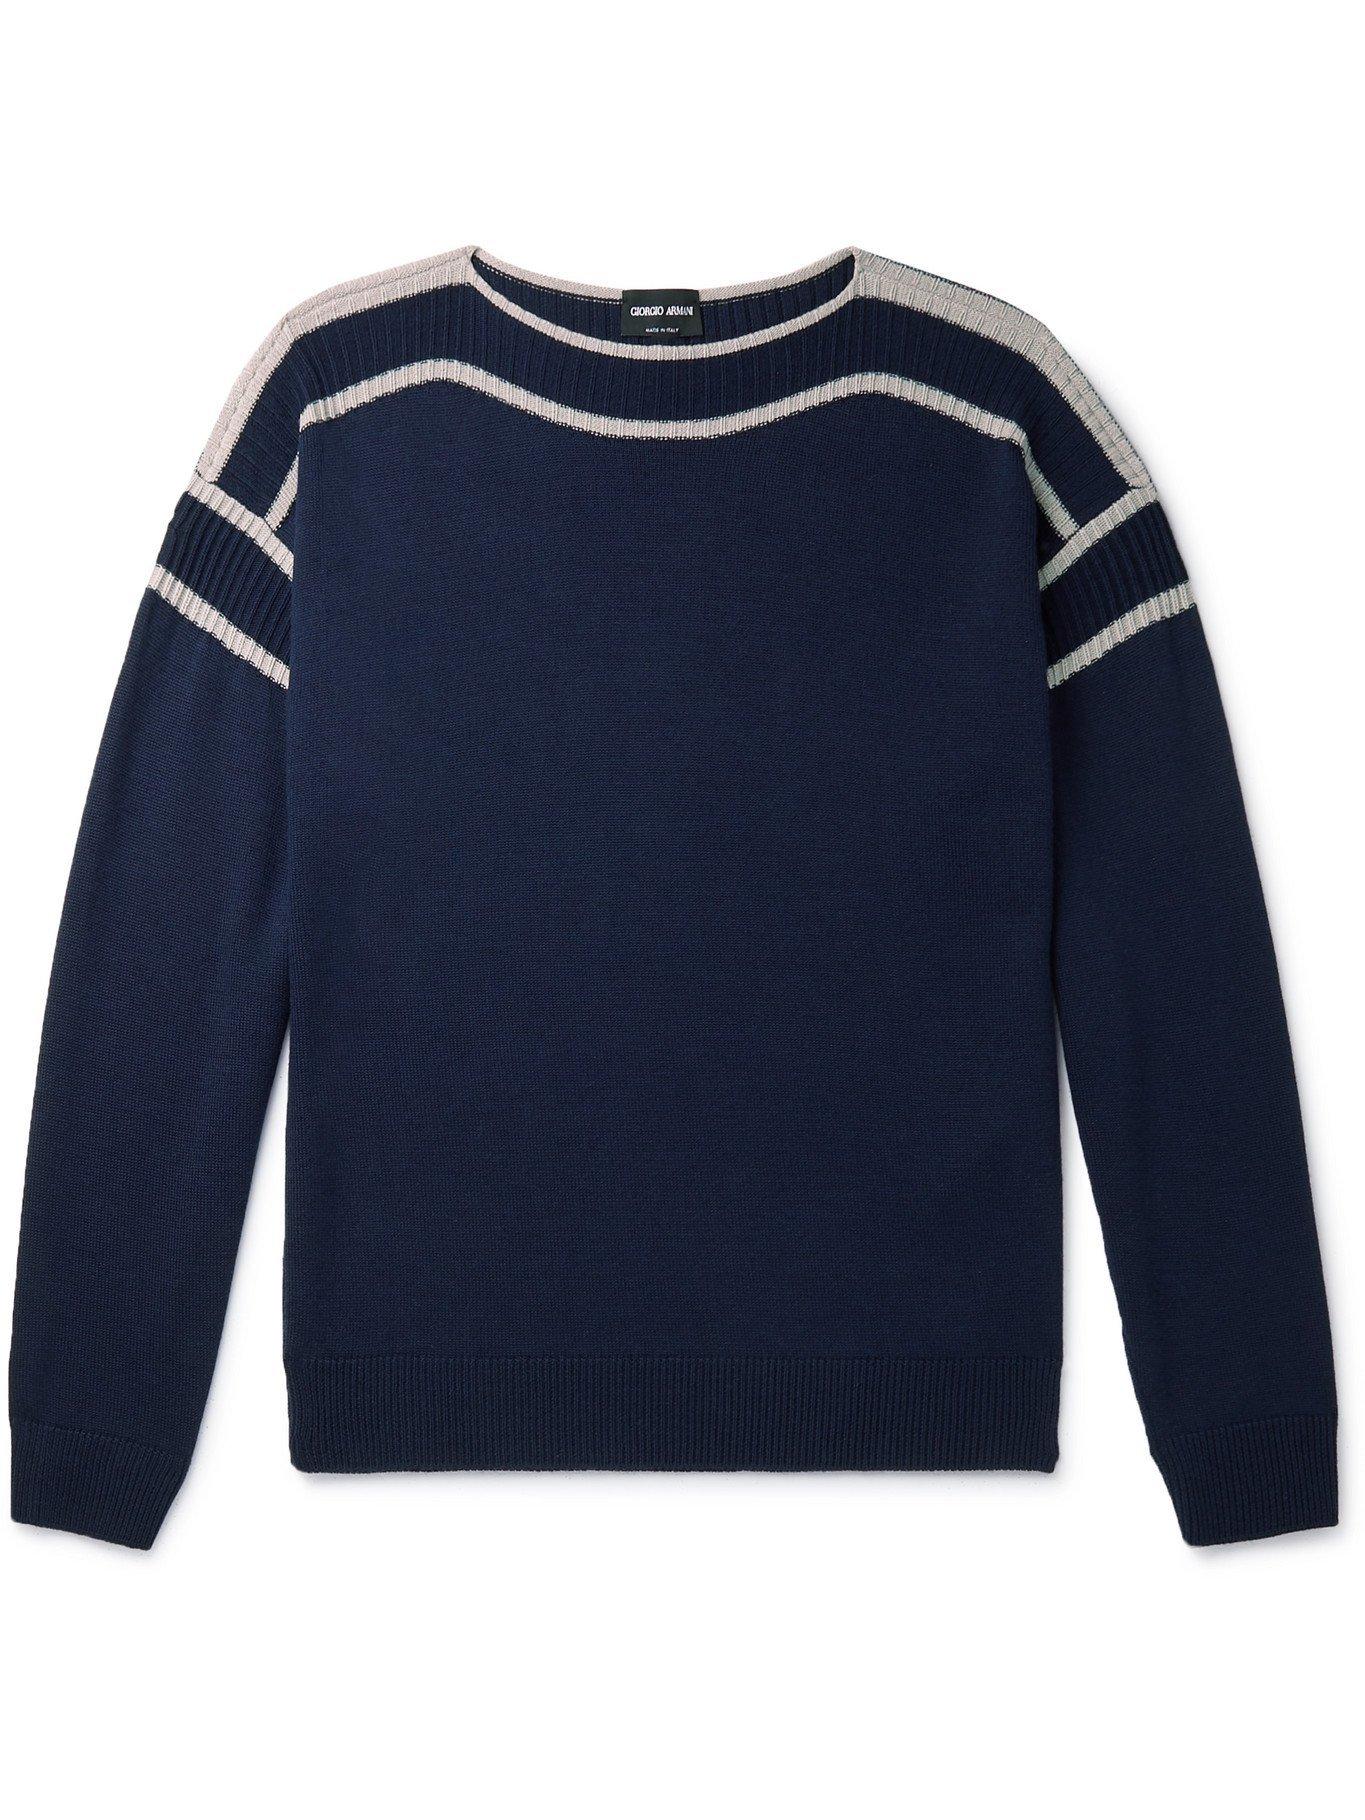 GIORGIO ARMANI - Striped Virgin Wool and Silk-Blend Sweater - Blue